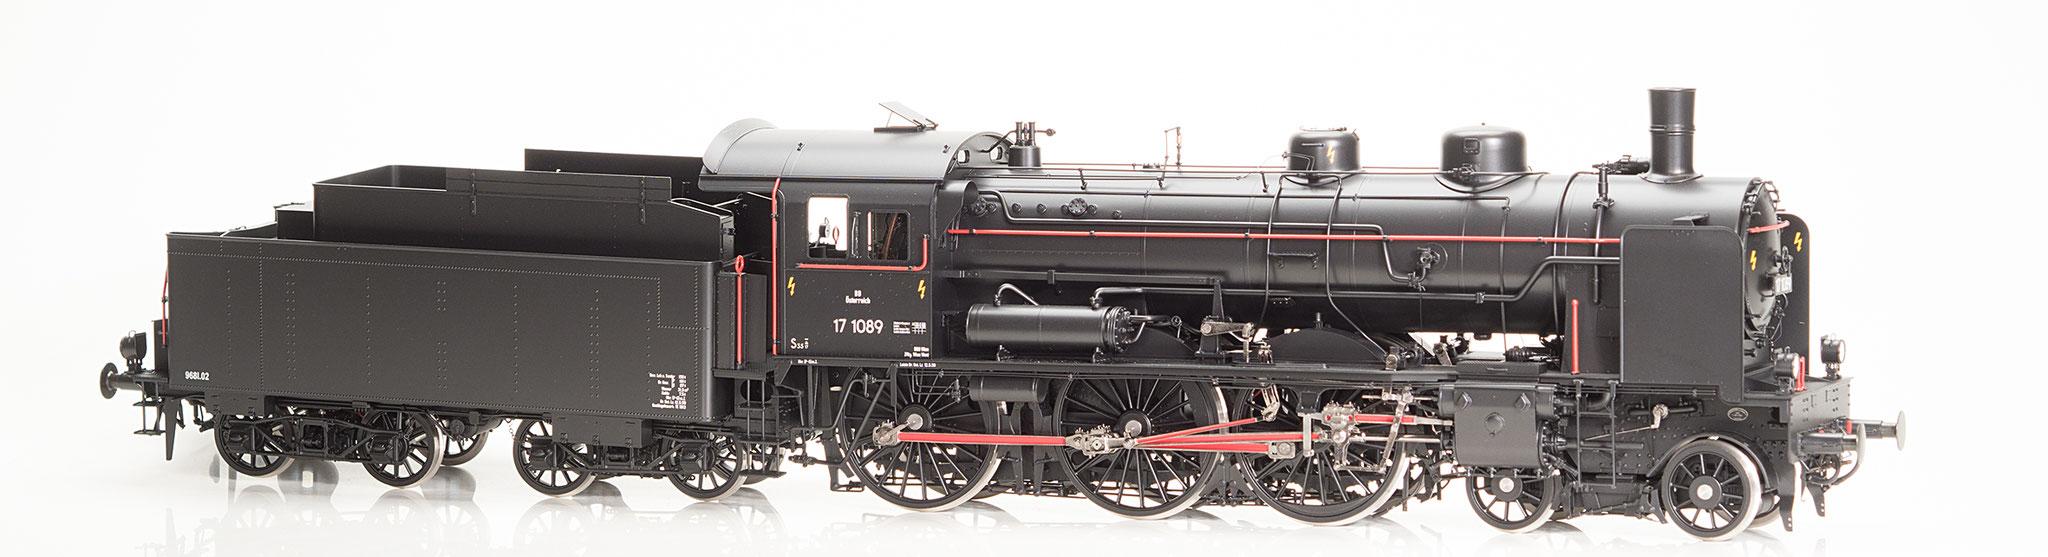 Bestell-Nr. 11012, BBÖ, Epoche III - Bauart 1911